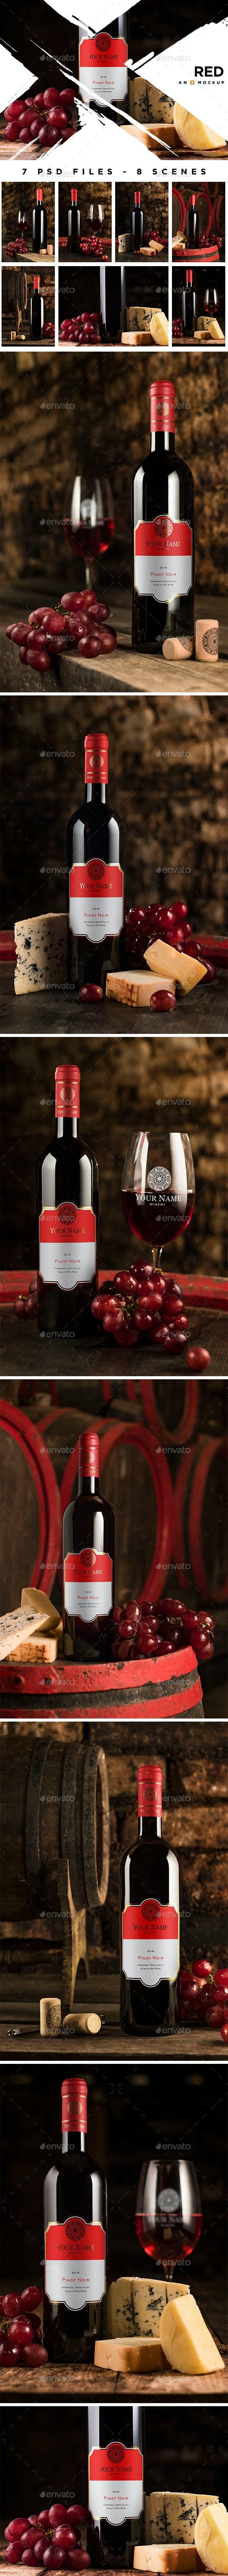 Cellar Wine Mockup - Red Wine - Product Mock-Ups Graphics